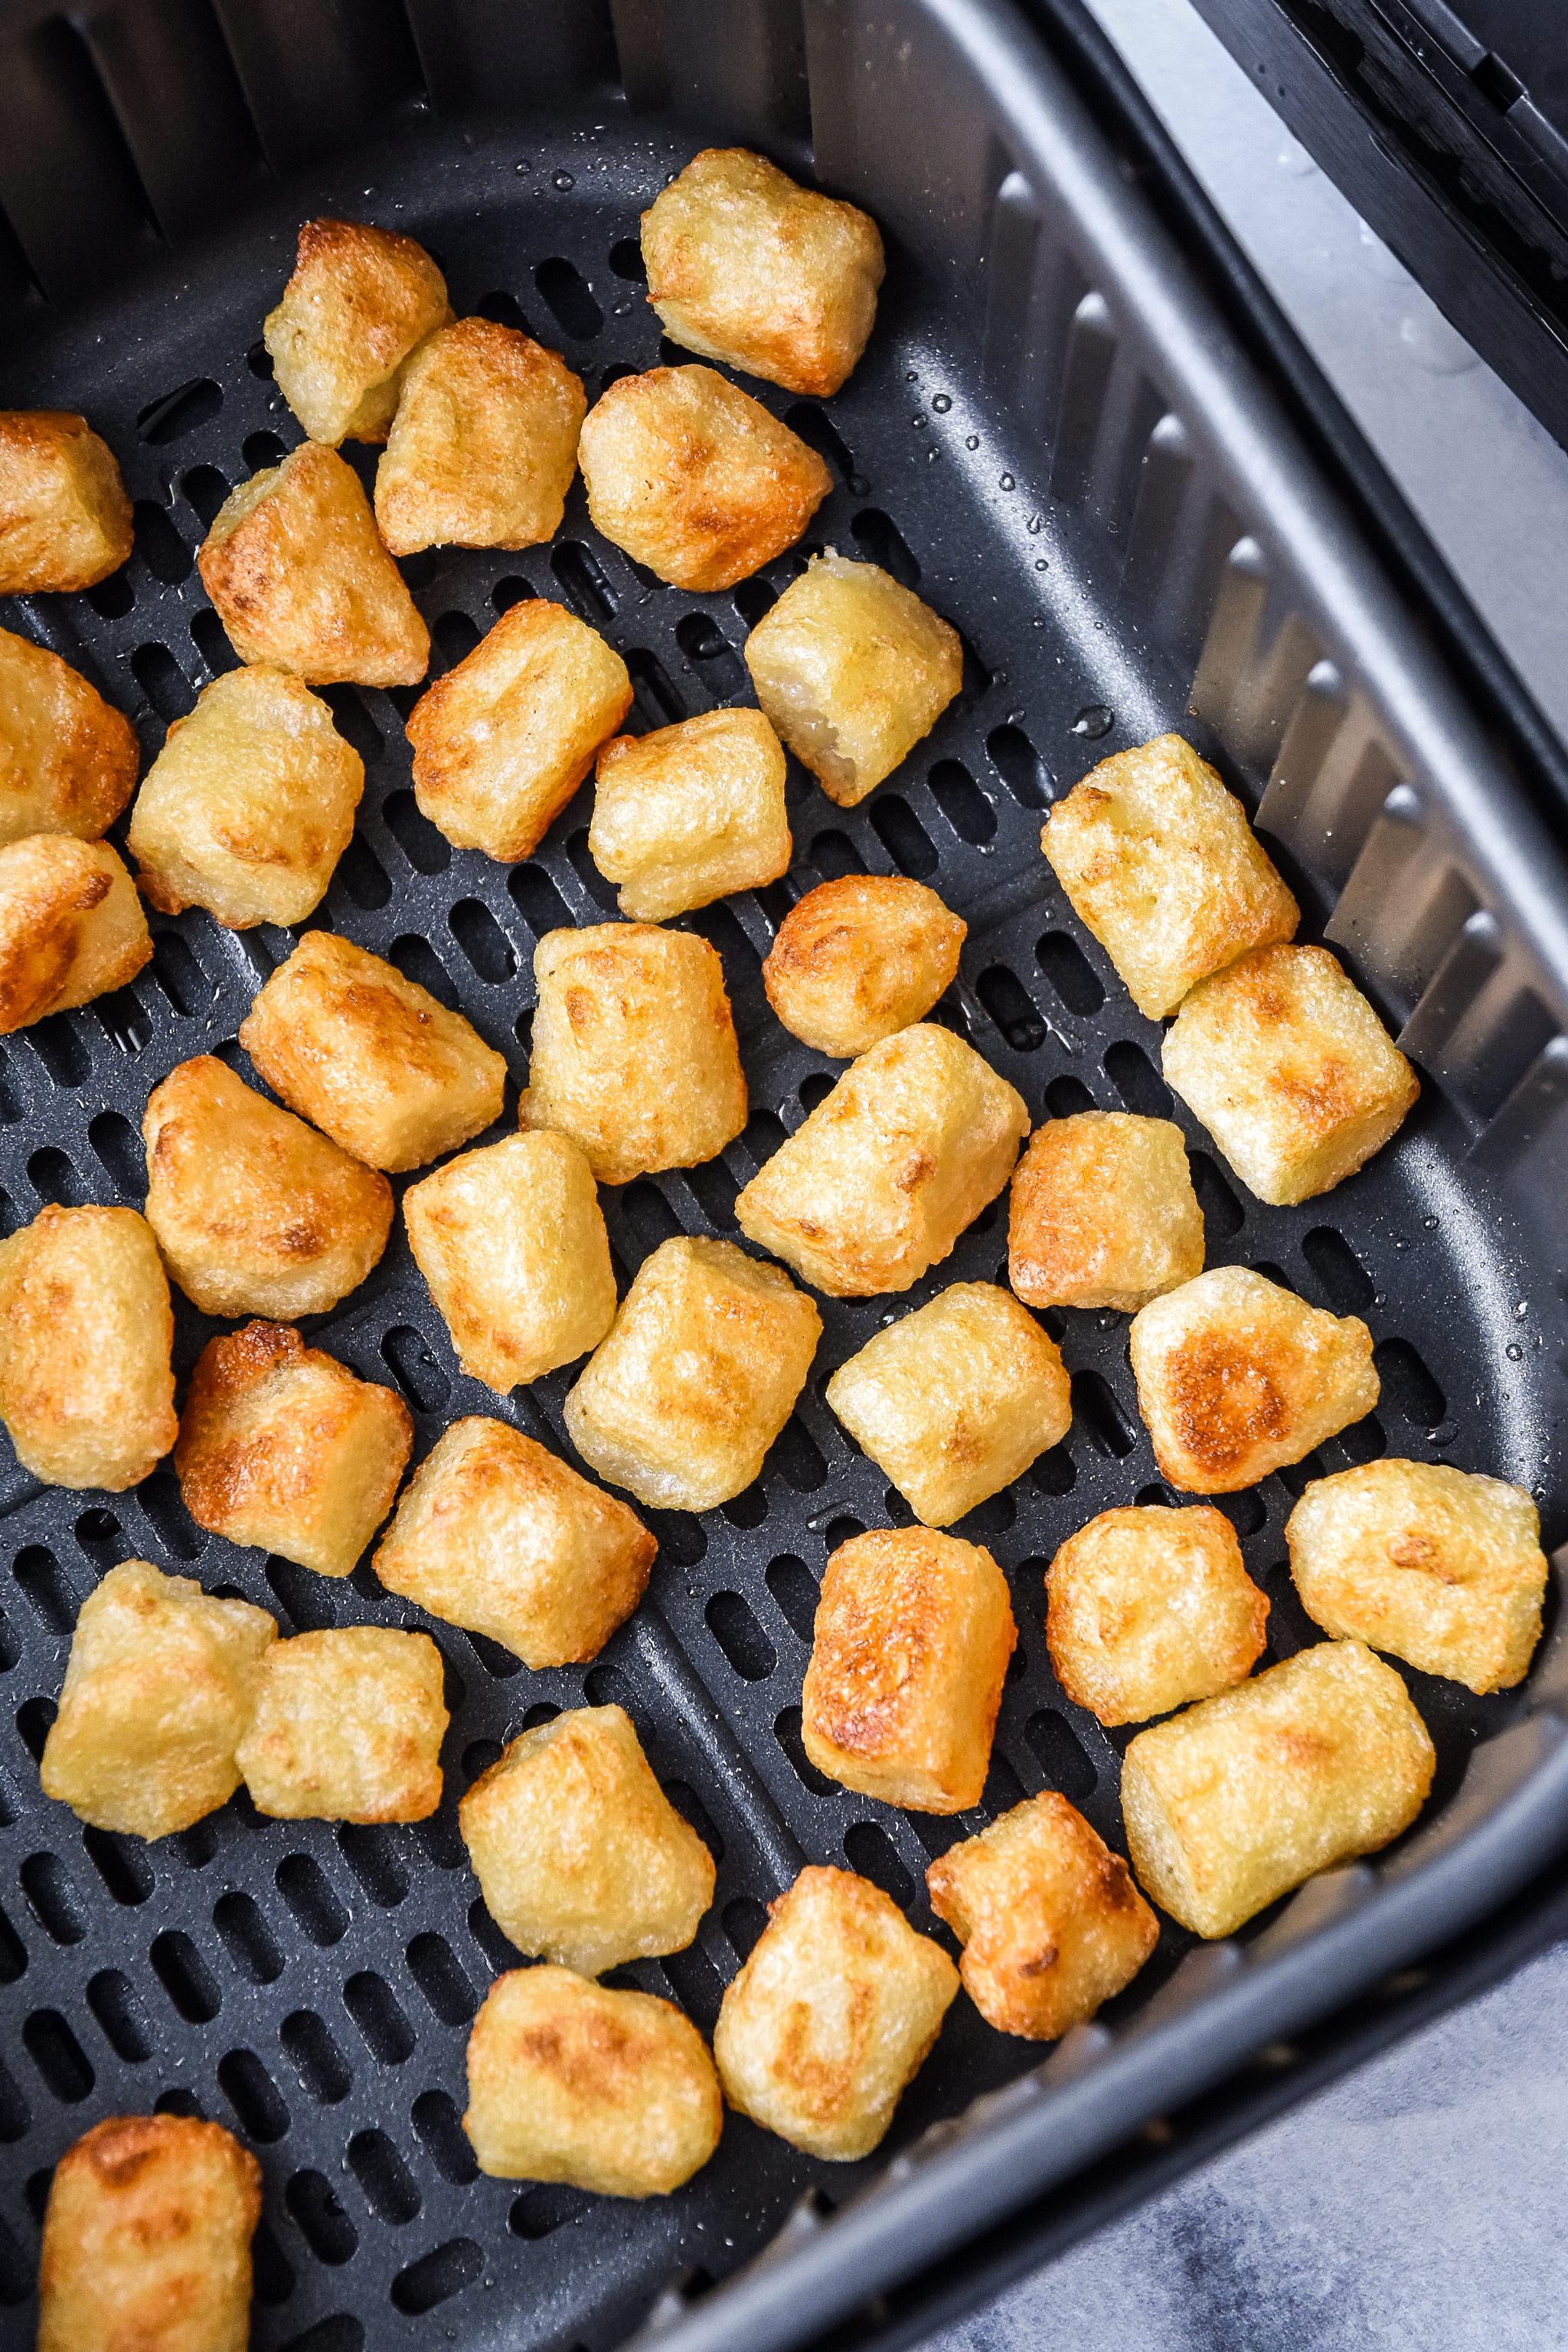 how to make cauliflower gnocchi in an air fryer